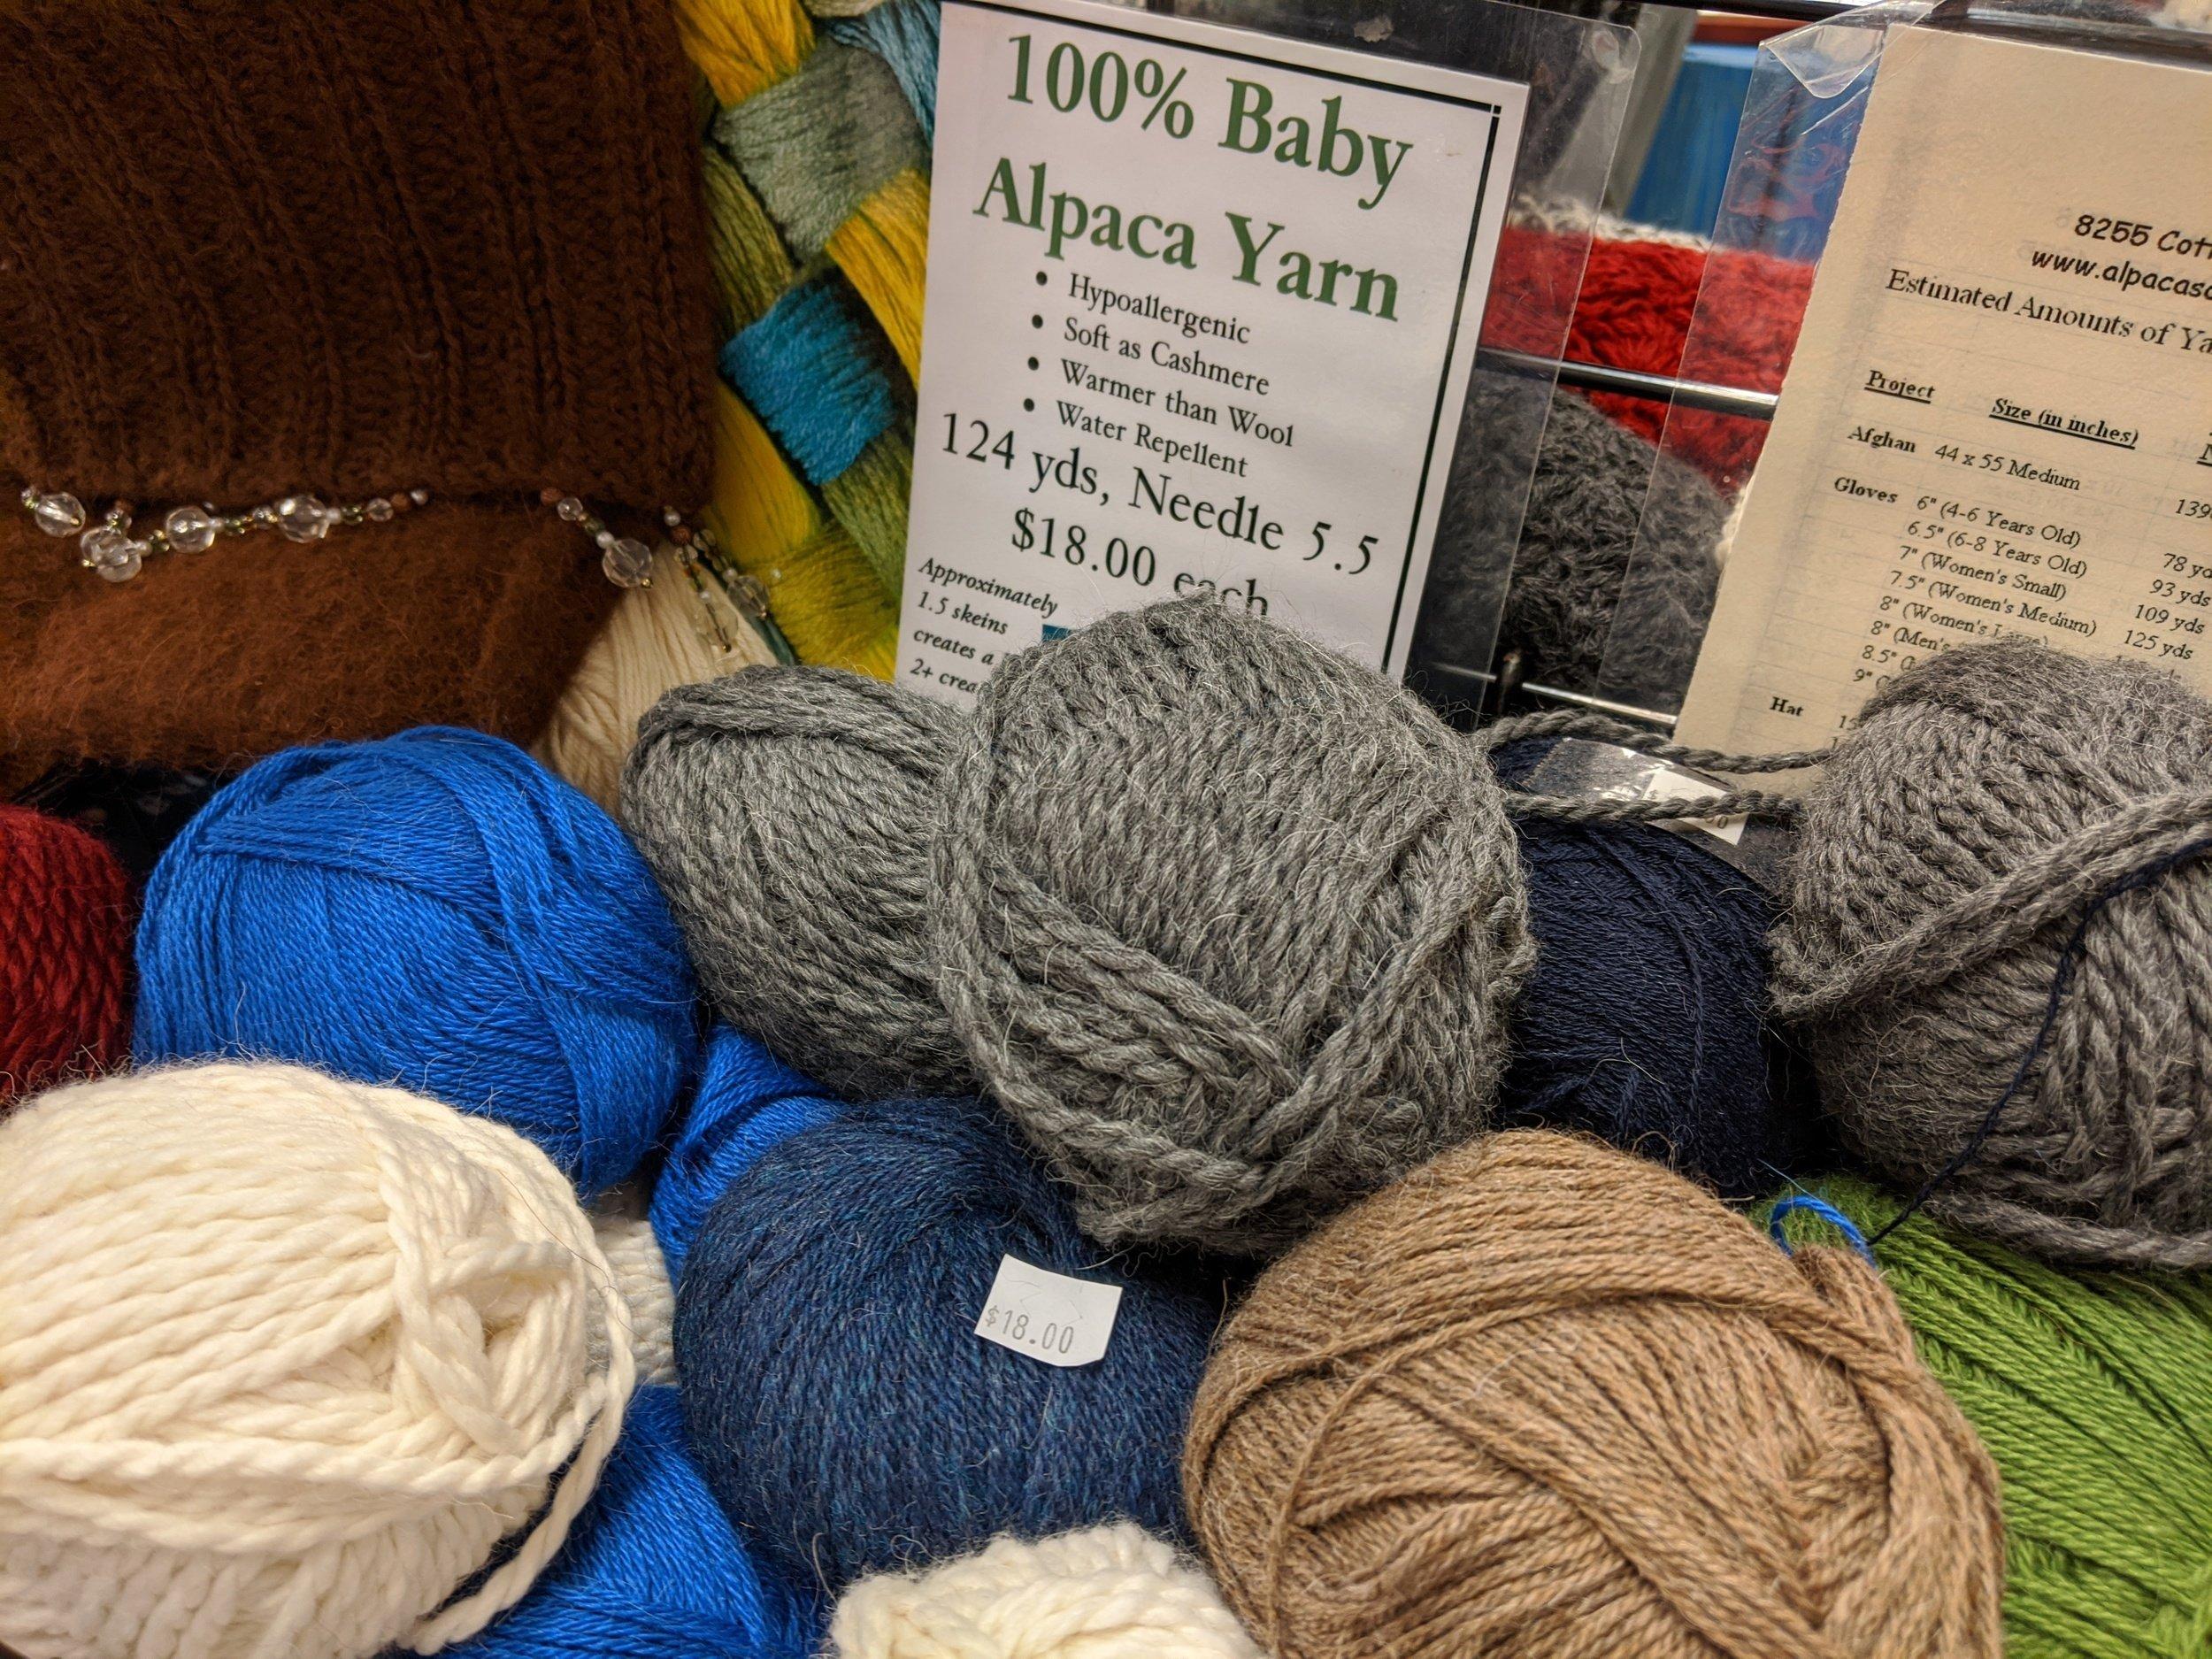 alpaca wool yarn owenhouse ace hardware - Bozeman, Montana